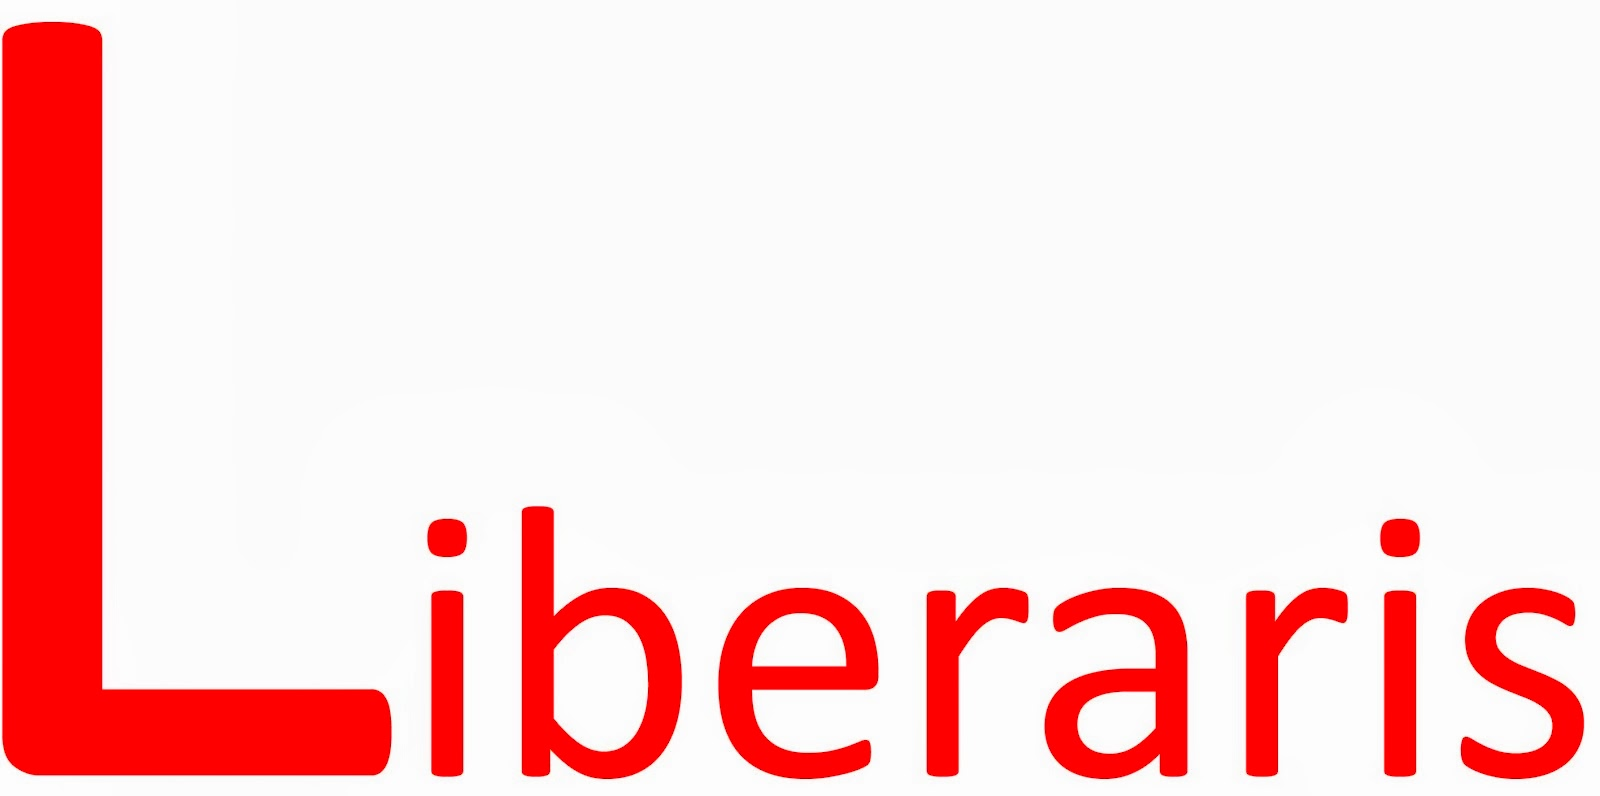 www.liberaris.com